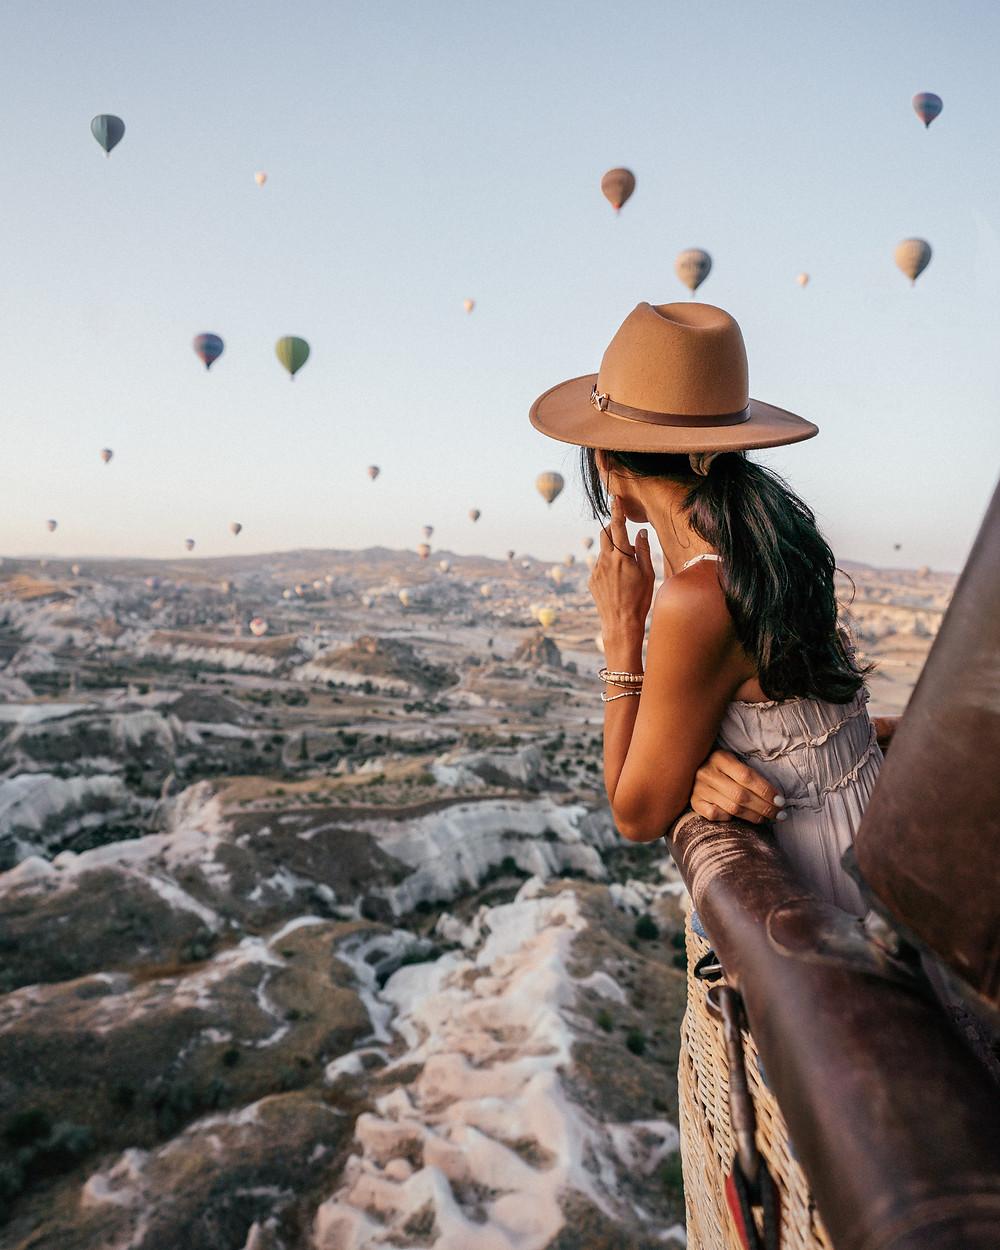 Hot Air Balloon Ride, Cappadocia, Turkey